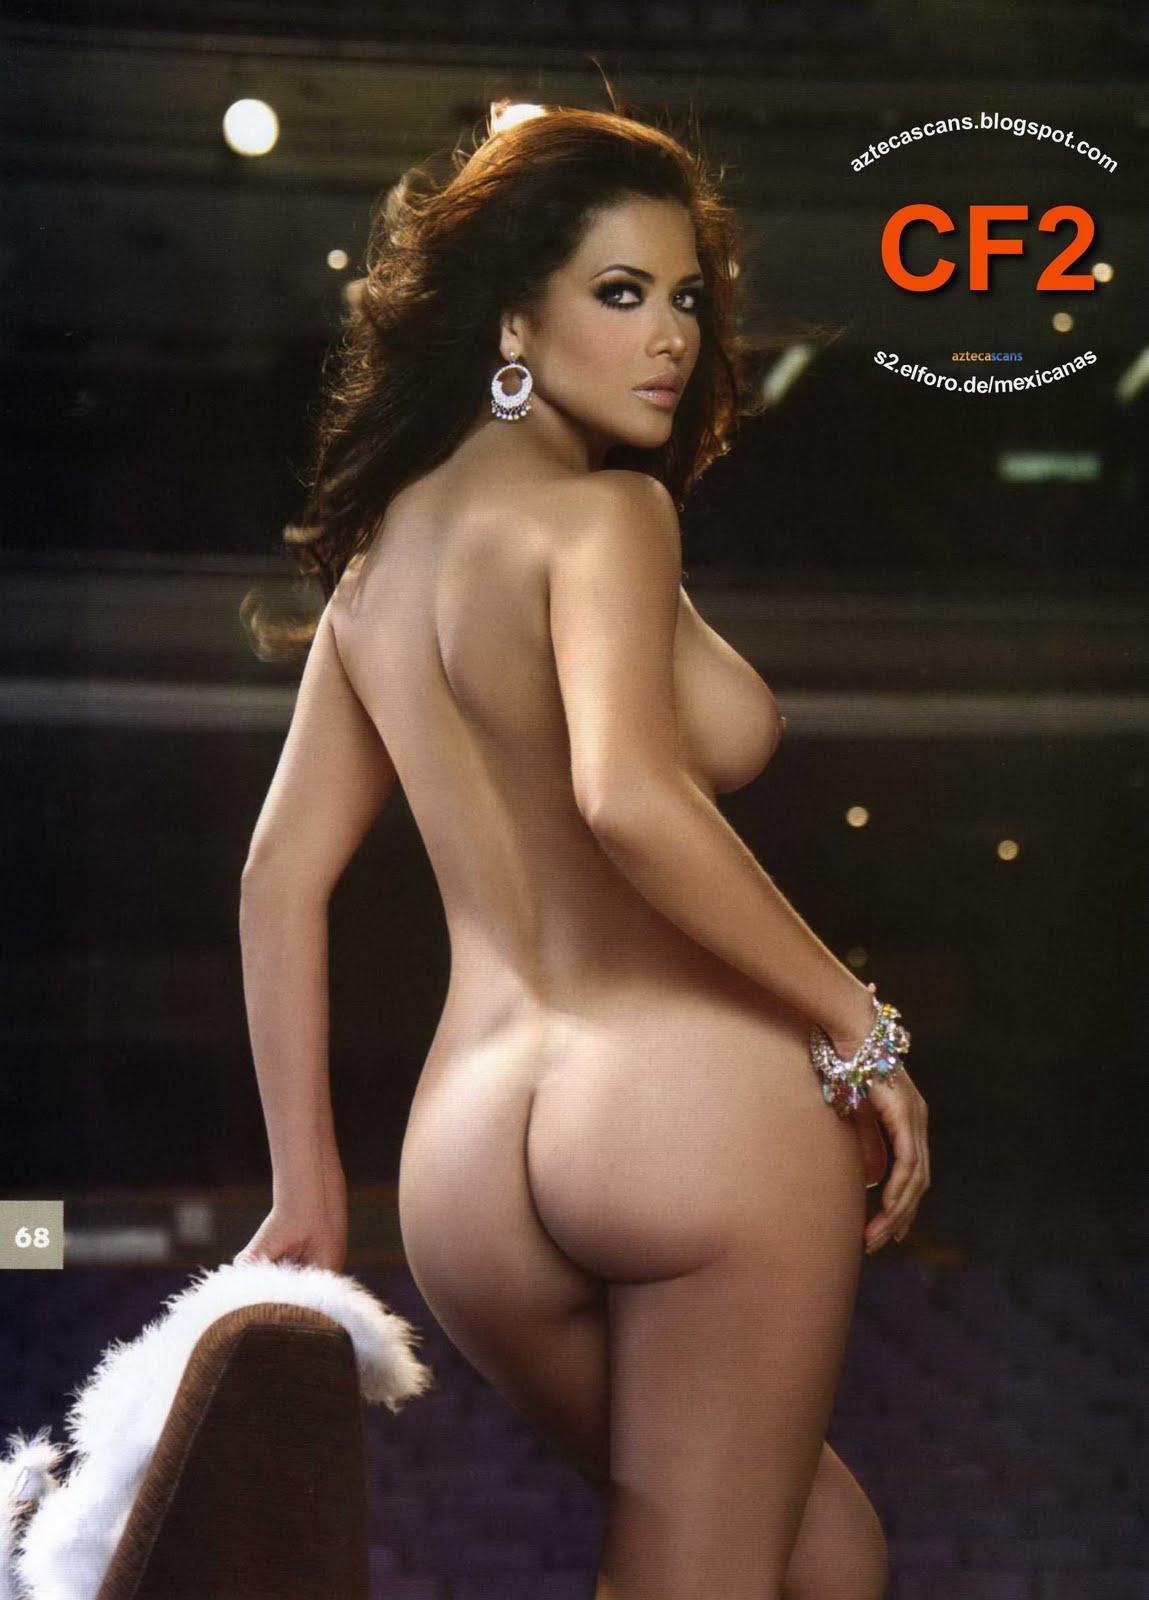 Ana Brenda Des Nuda gabriela goldsmith desnuda   free download nude photo gallery